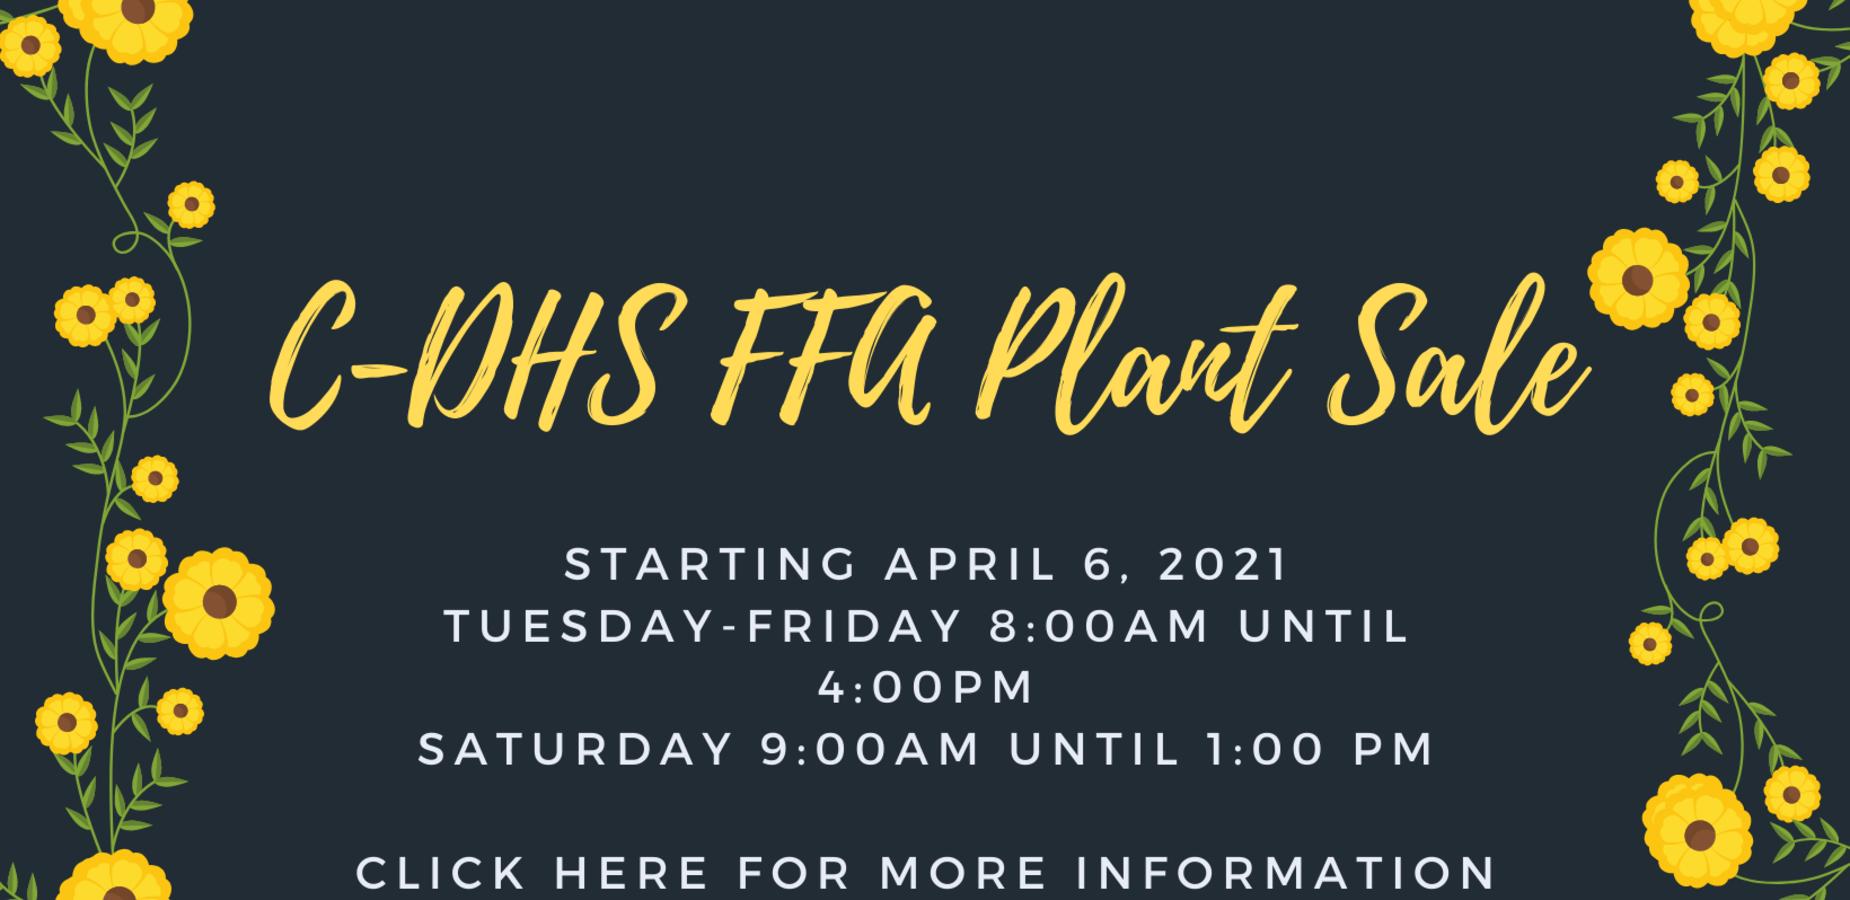 C-DHS FFA Plant Sale begins April 6, 2021